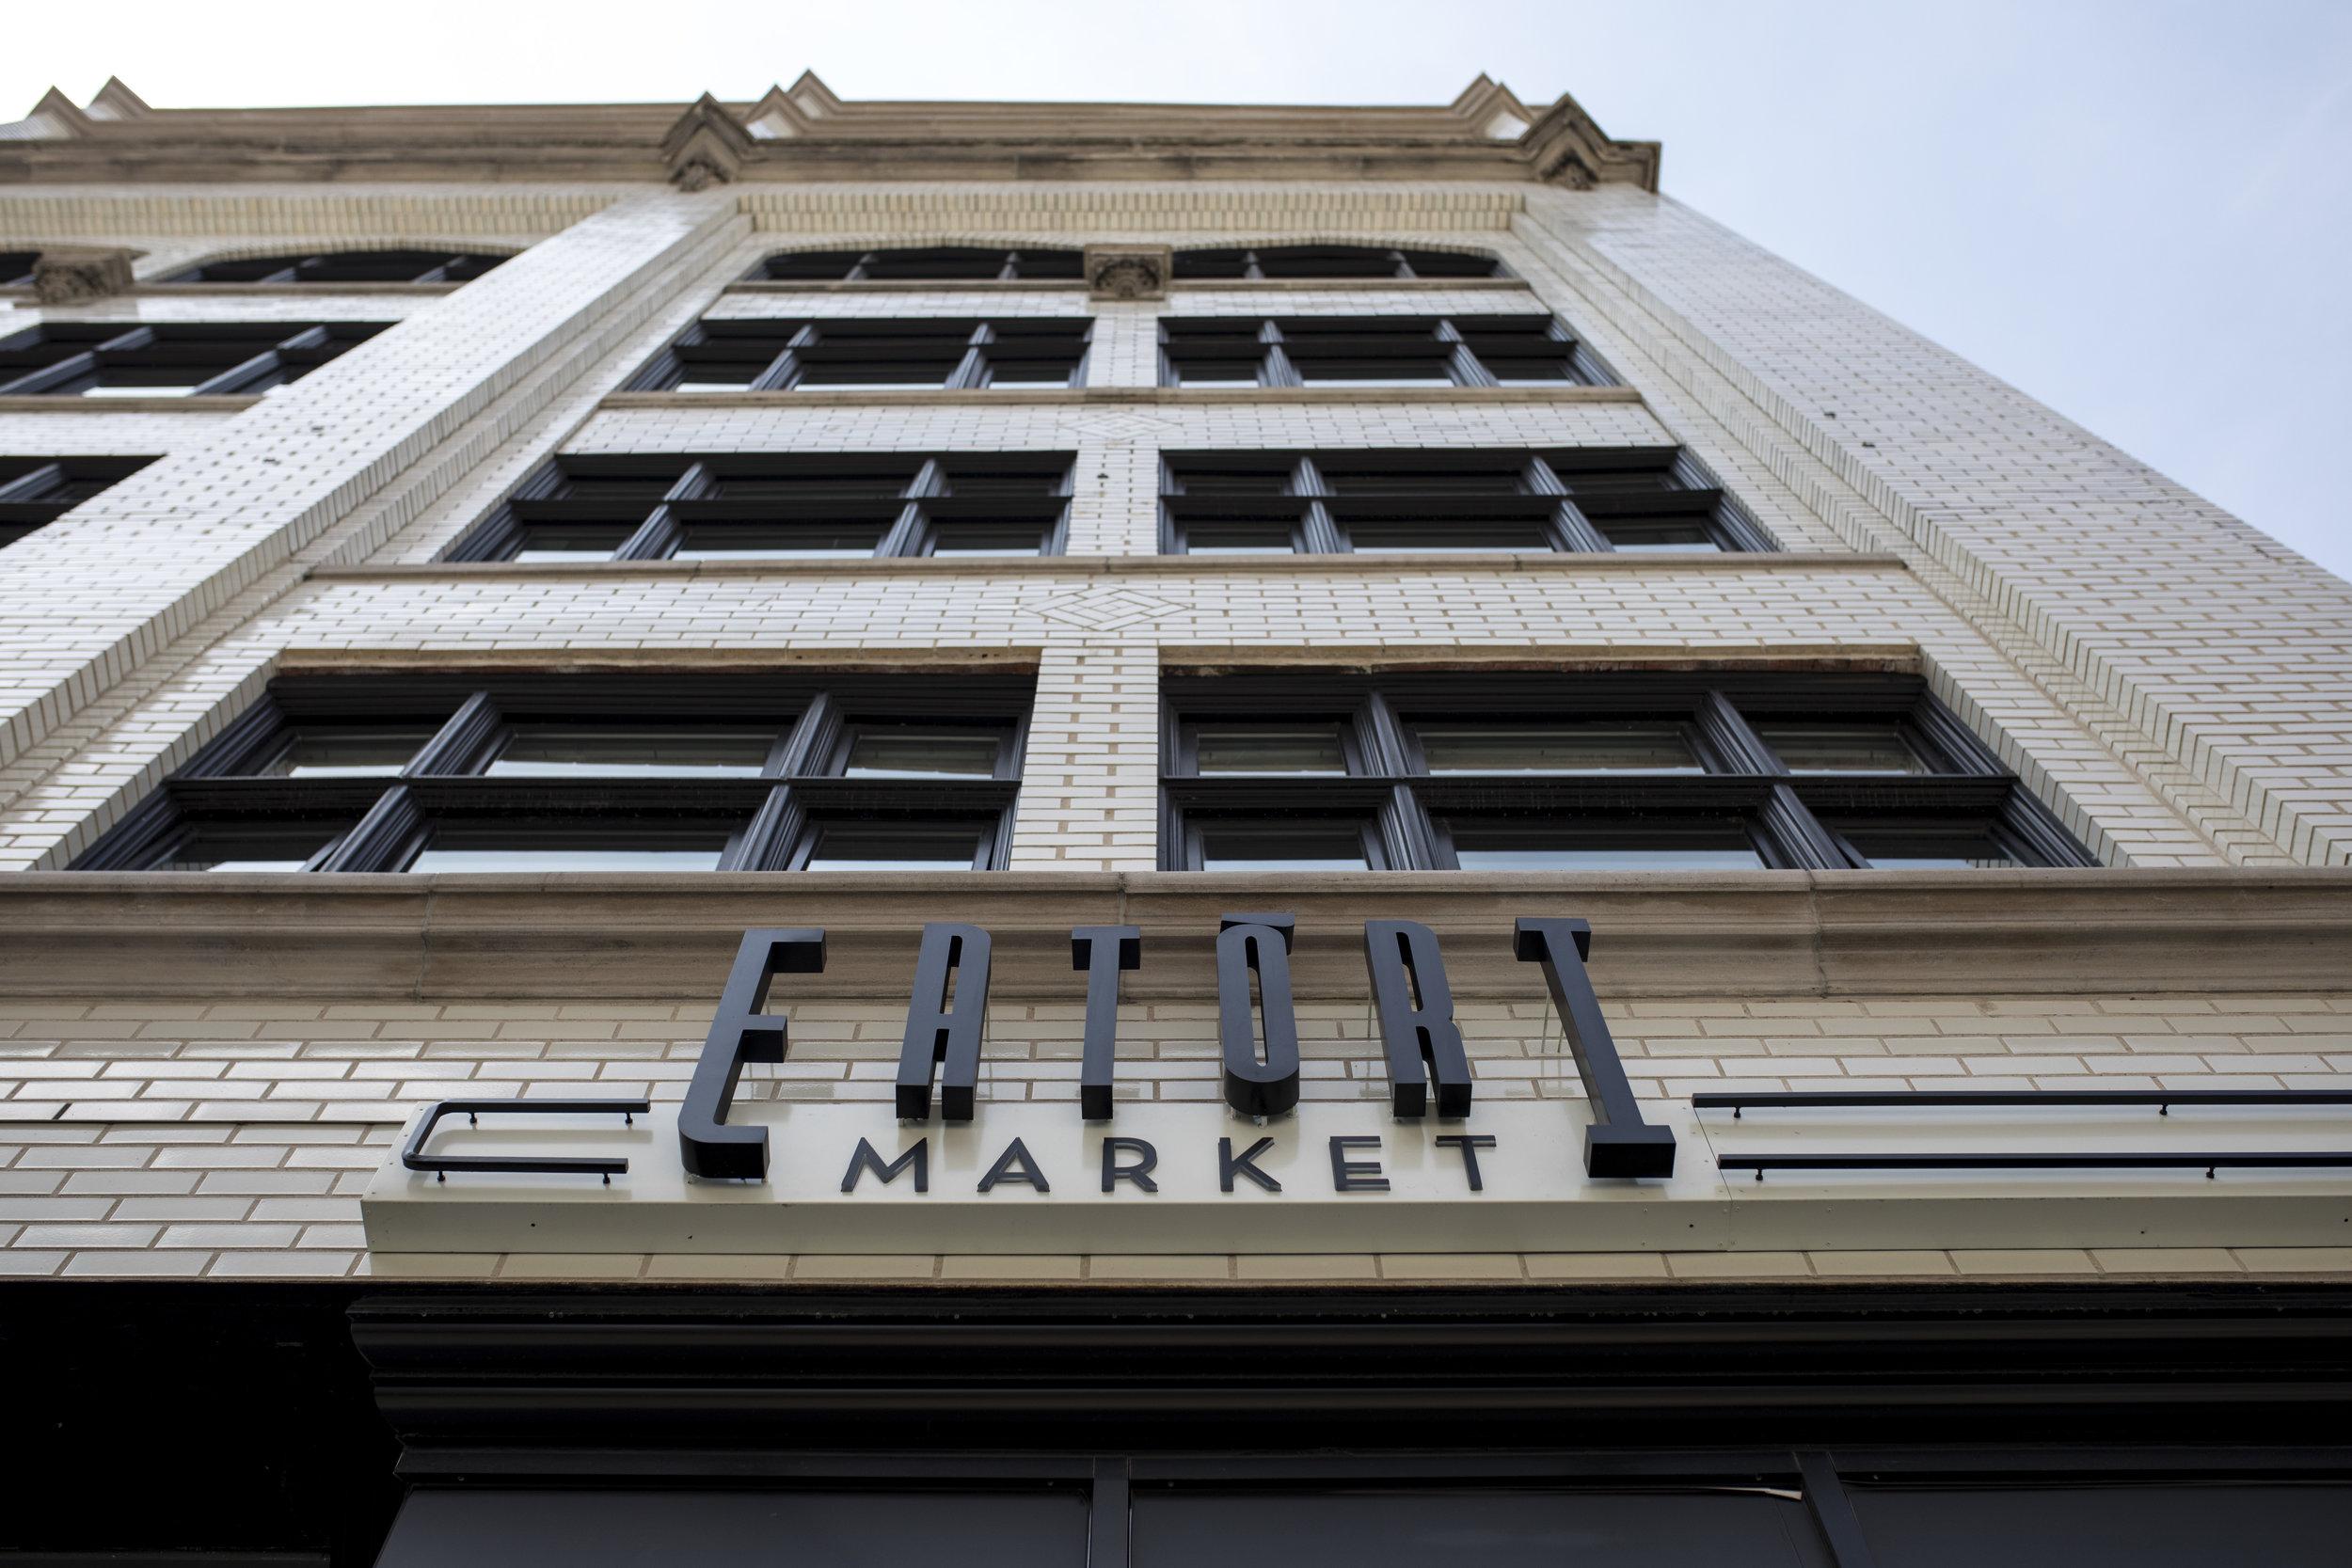 Eatori Market - Build Out Documentation Fall '17